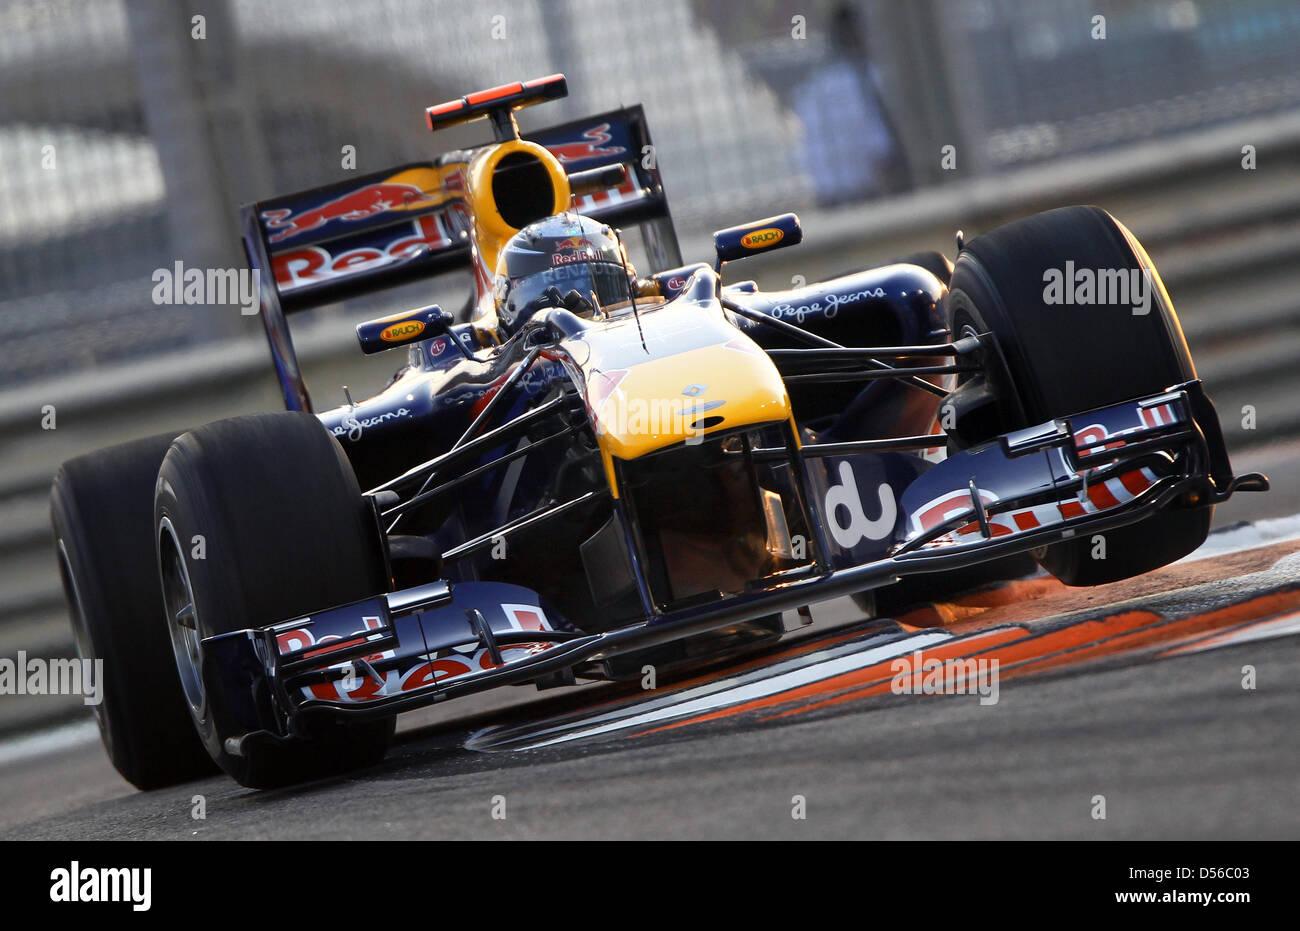 d598fdbe German driver Sebastian Vettel of Red Bull Racing during Qualfying session  at Yas Marina Circuit race track in Abu Dhabi, United Arab Emirates, ...